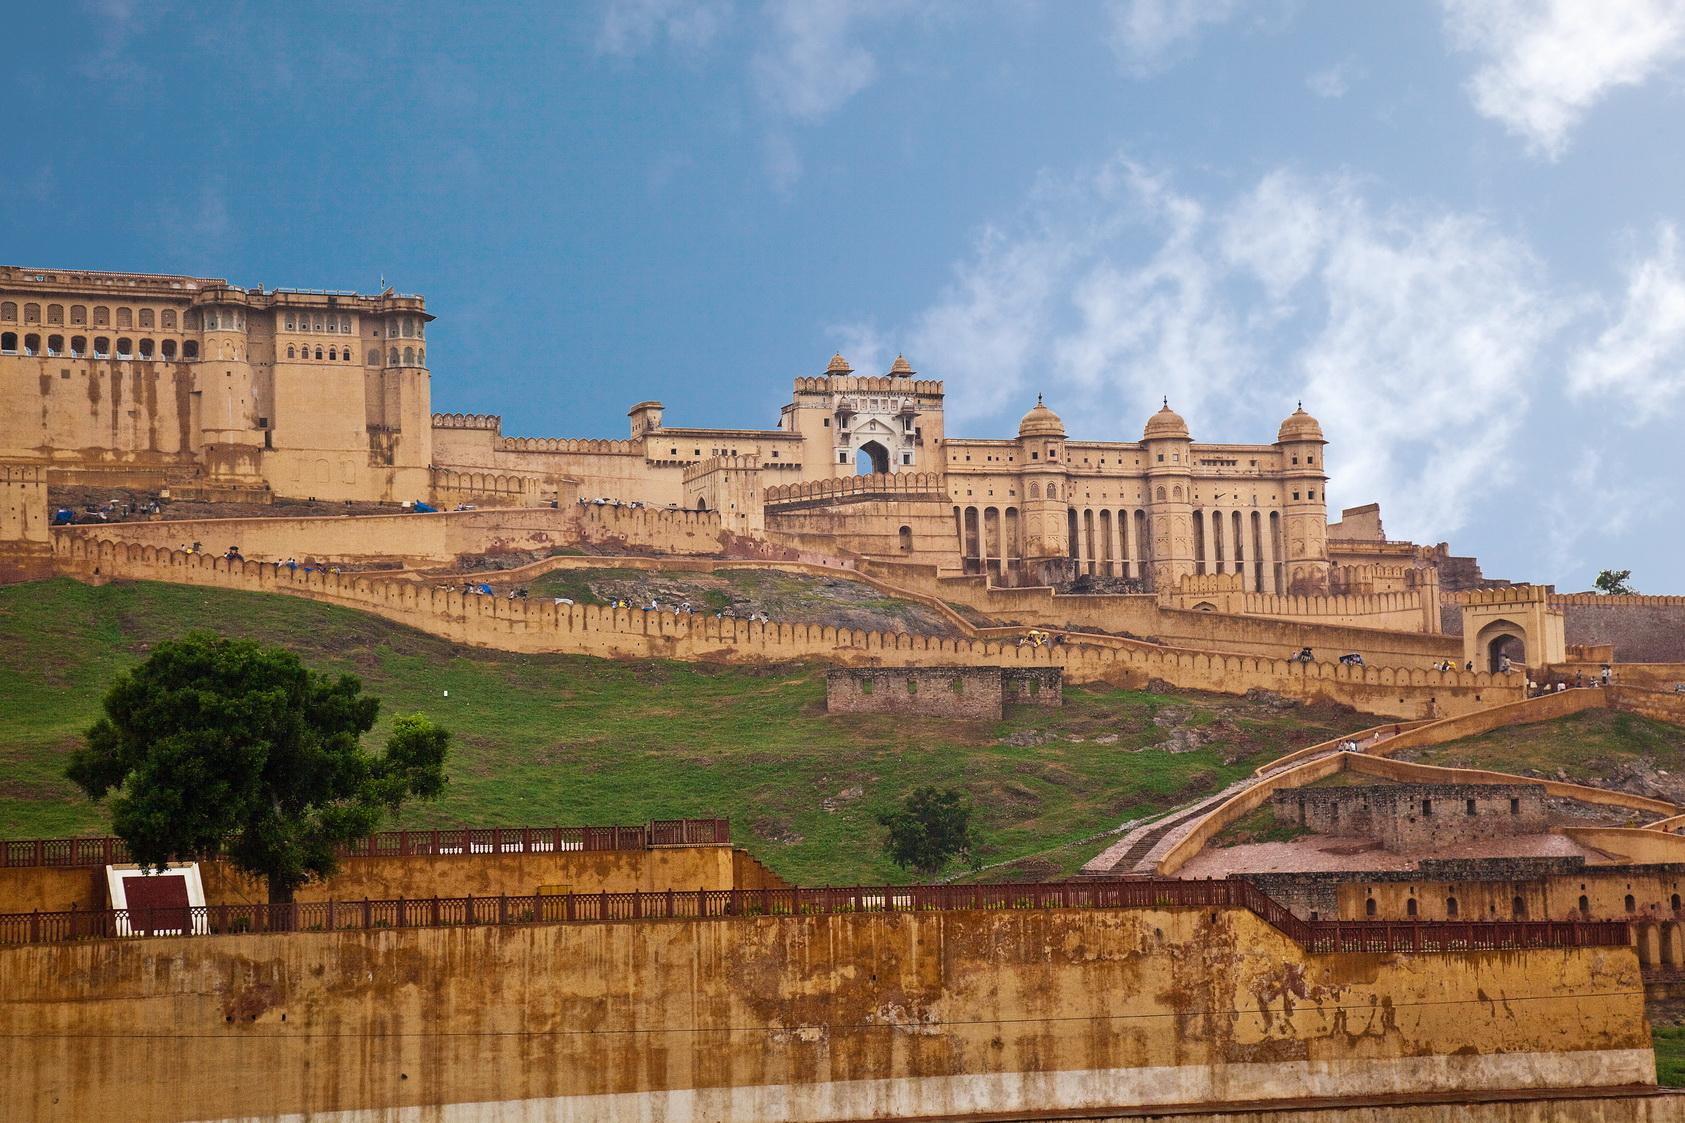 Amber-Fort-Jaipur 10 Lugares Más famosos para Visitar en Rajastán